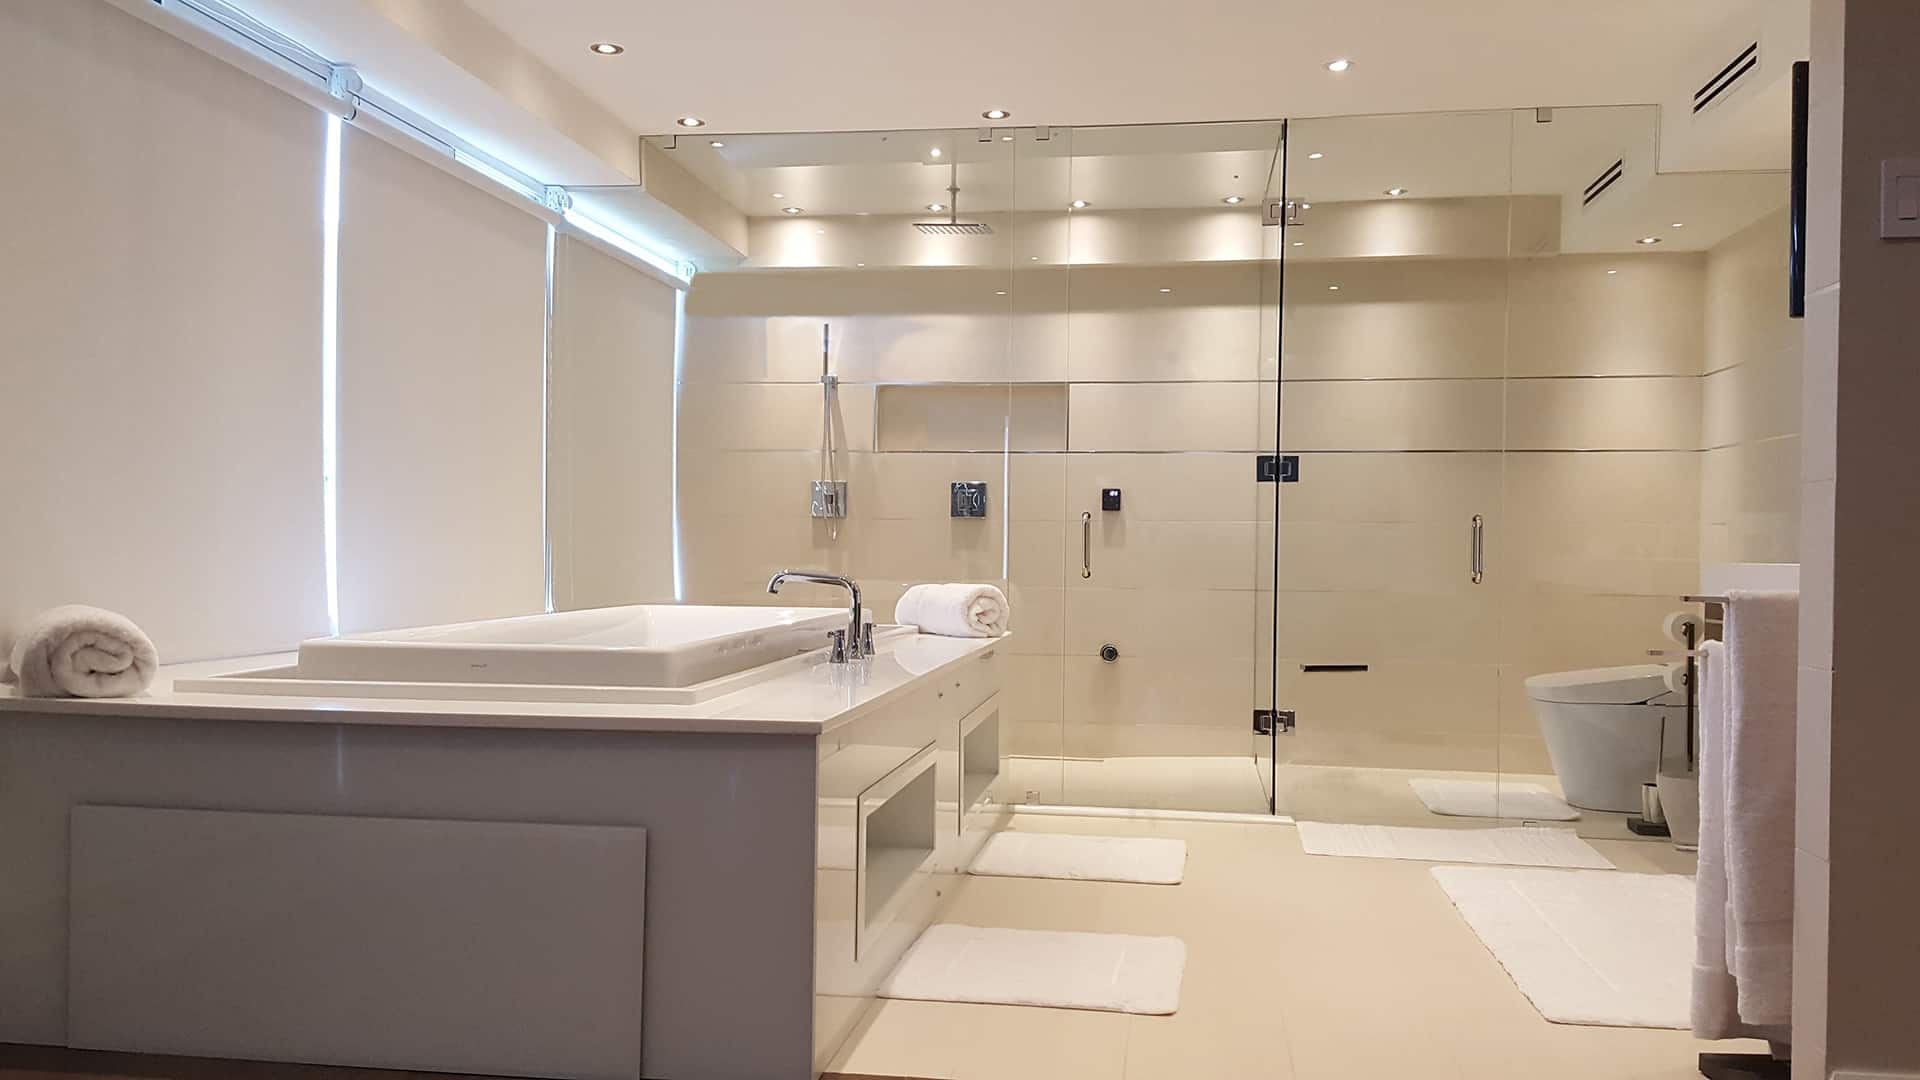 Aldora的玻璃淋浴门,步入式淋浴,浸水浴缸,瓷砖,豪华主浴室,Aldora的玻璃淋浴墙